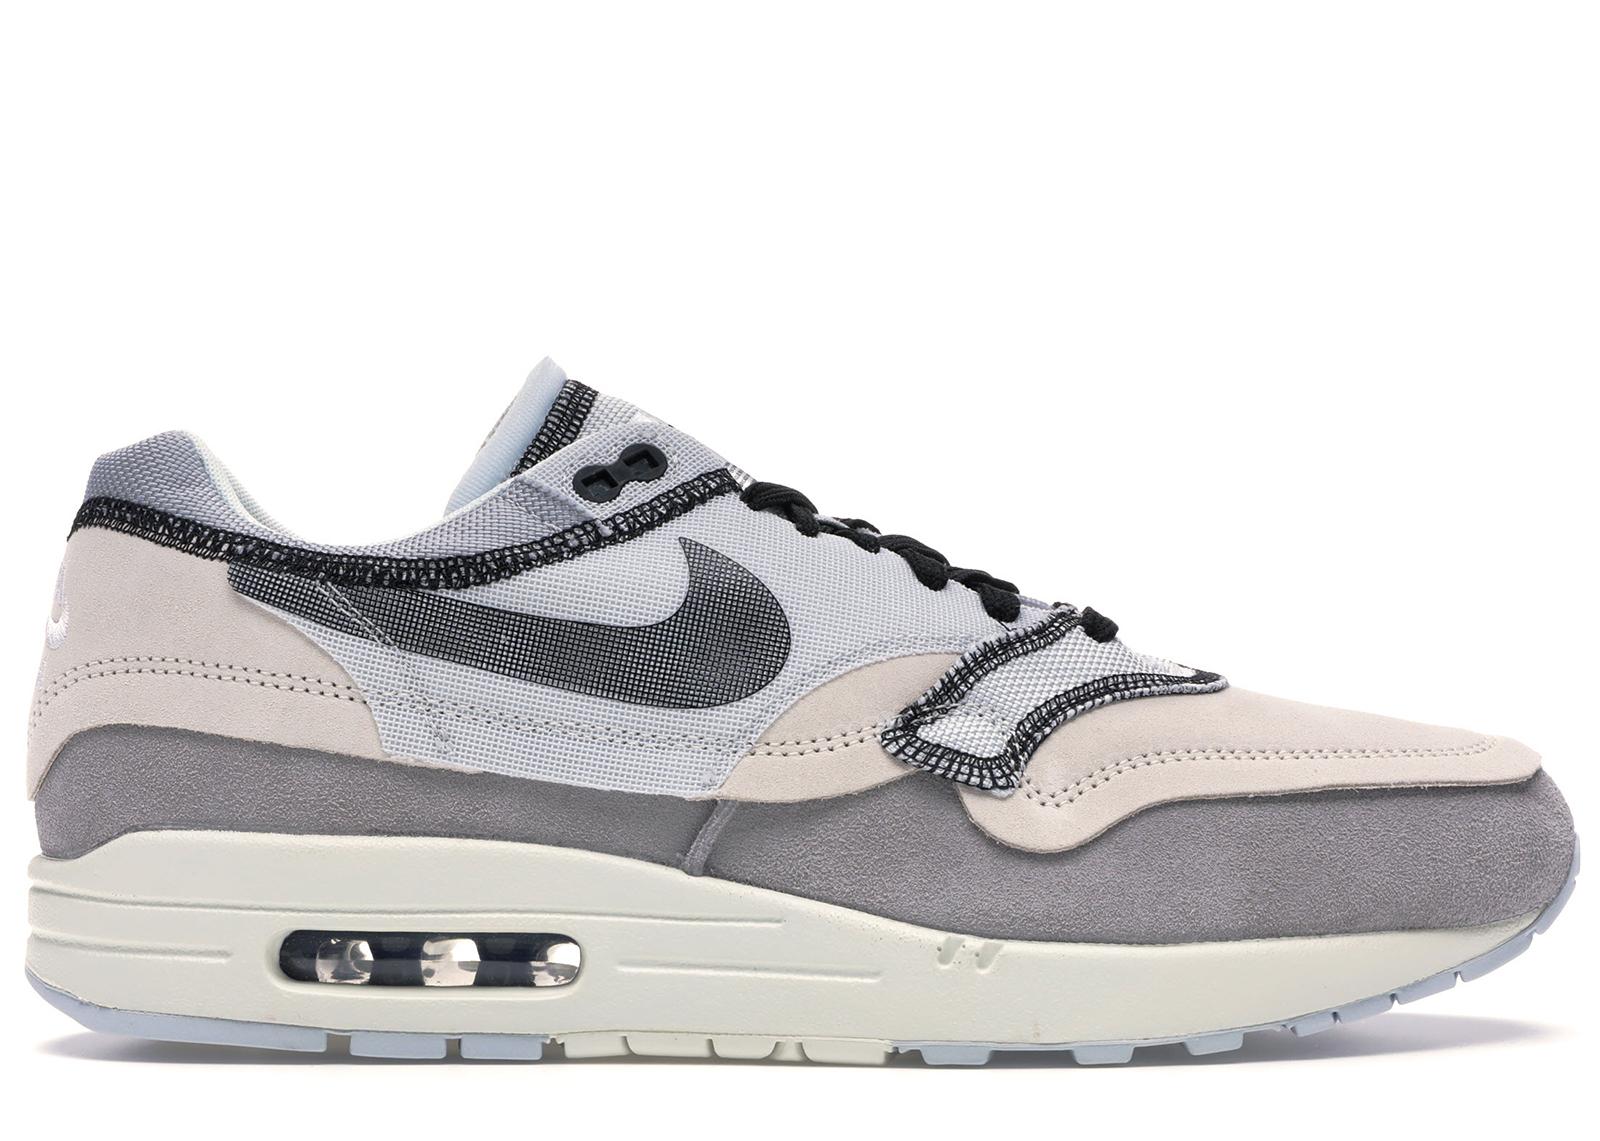 Acheter Nike Air Max 1 Chaussures et sneakers neuves